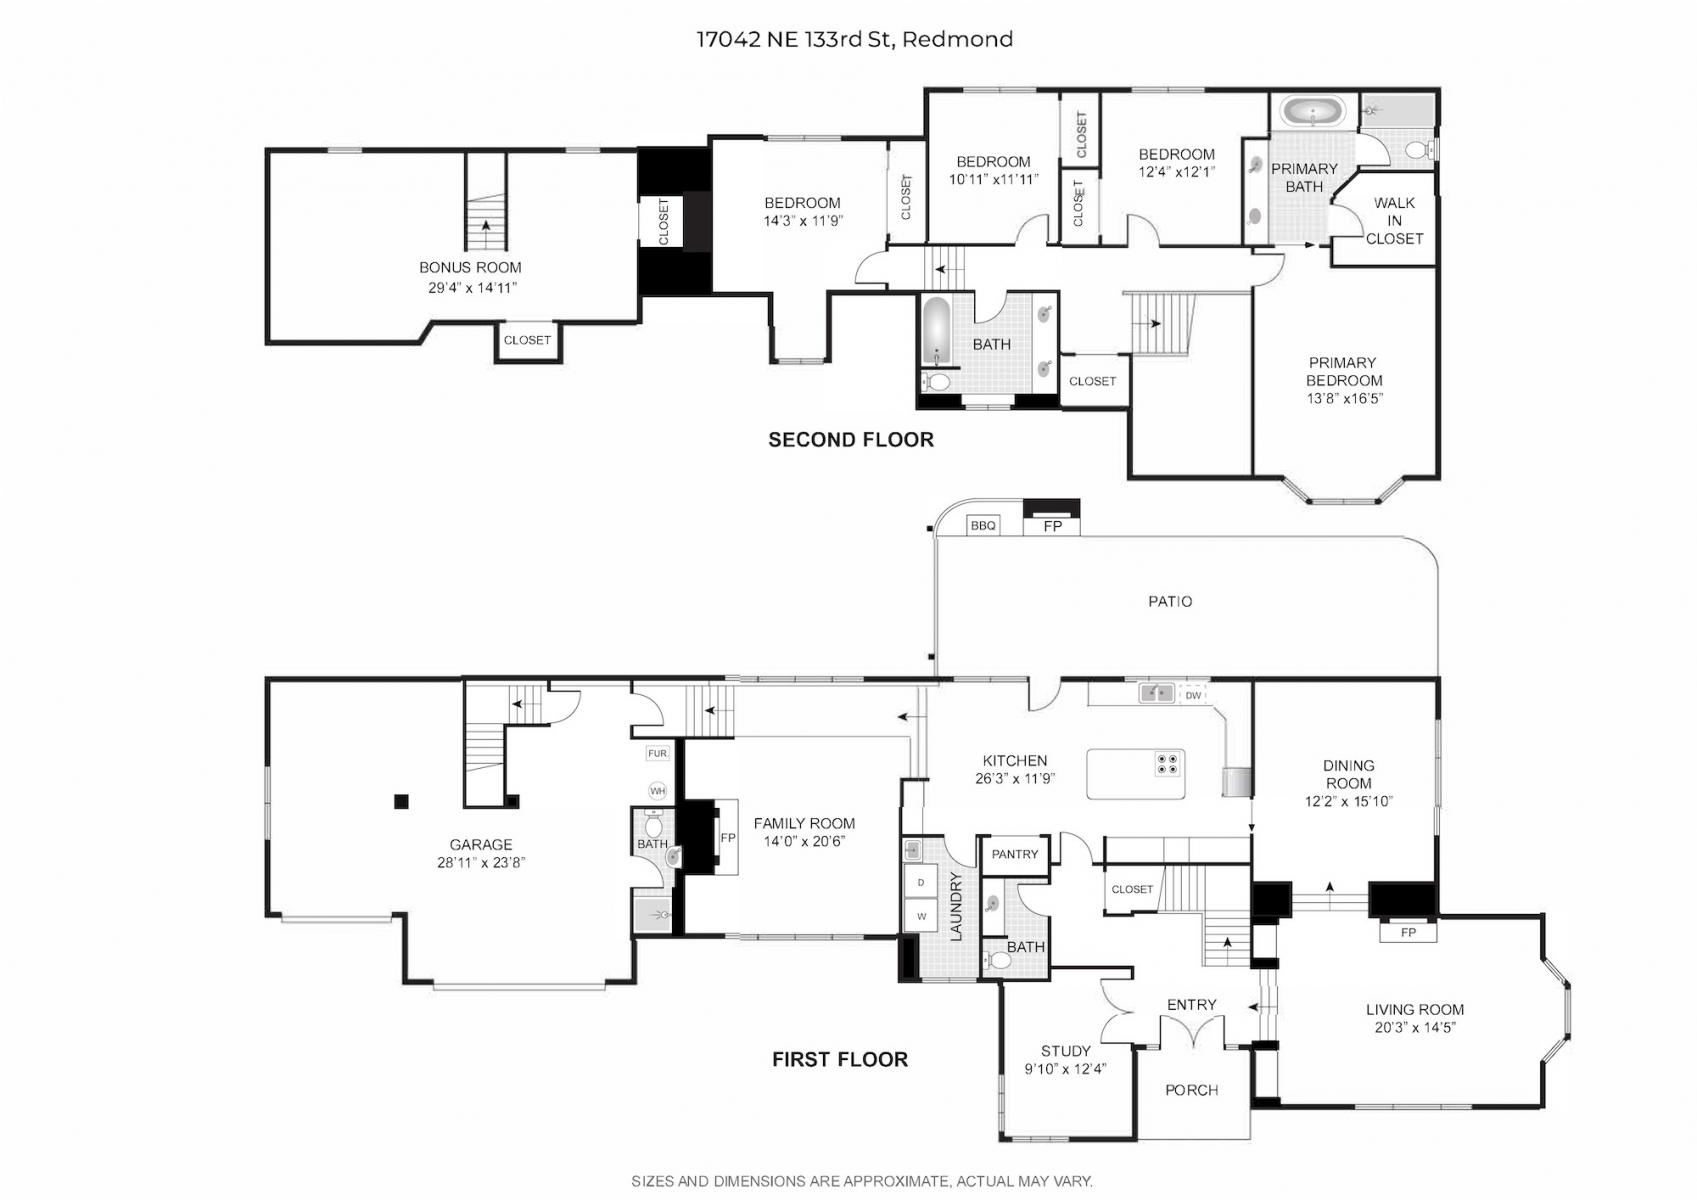 17042-NE-133rd-St-Redmond-Floorplan